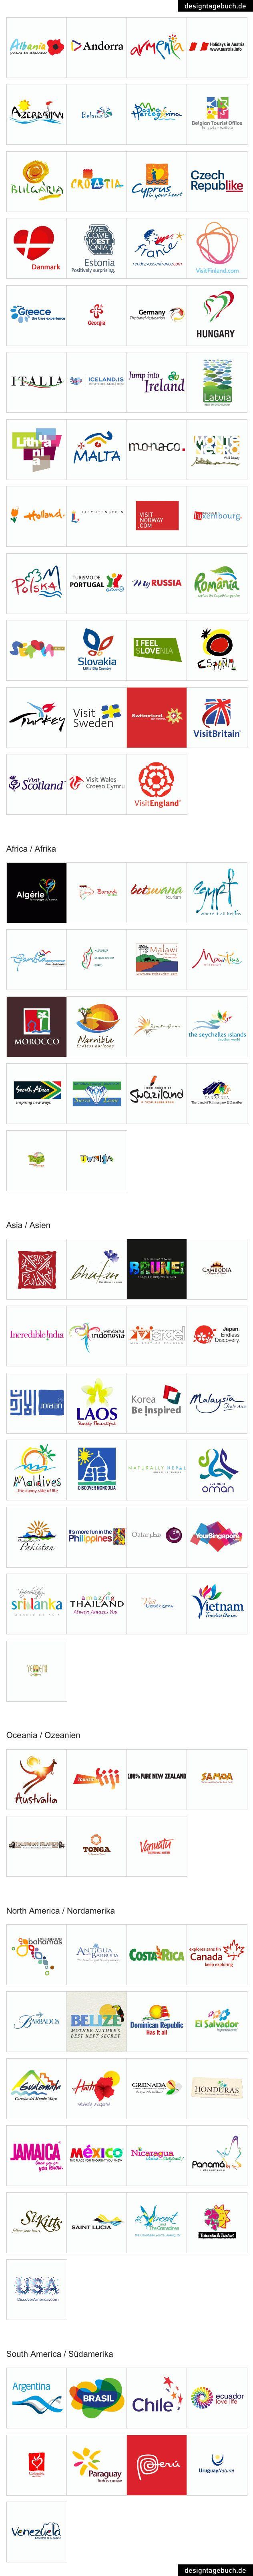 .: tourism-logos-national-branding